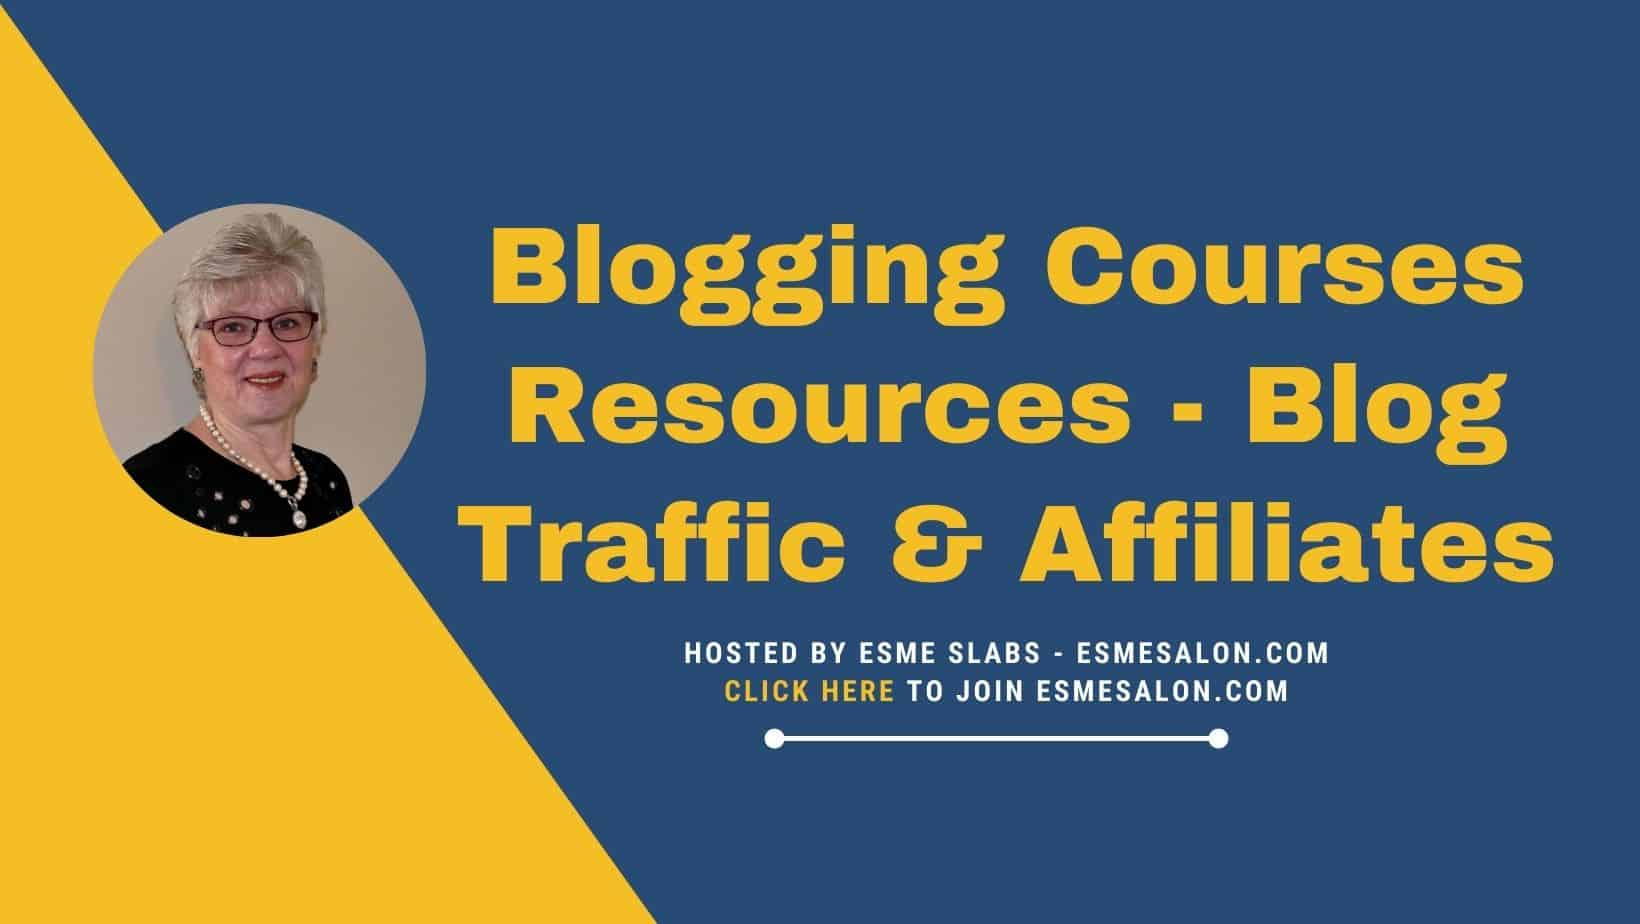 Logo for Blogging Courses Resources - Blog Traffic & Affiliates